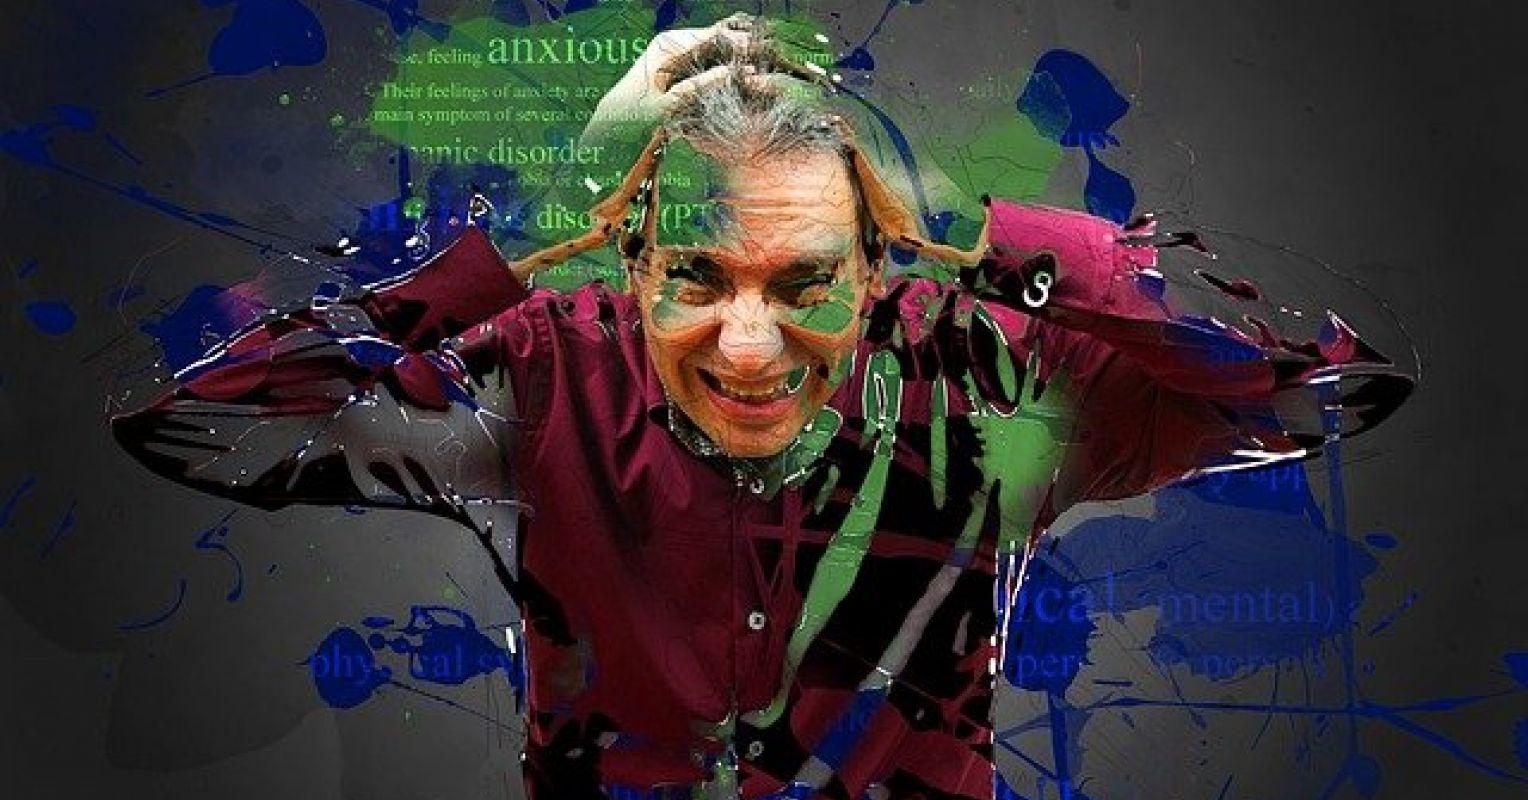 Neurotic Pete Linforth